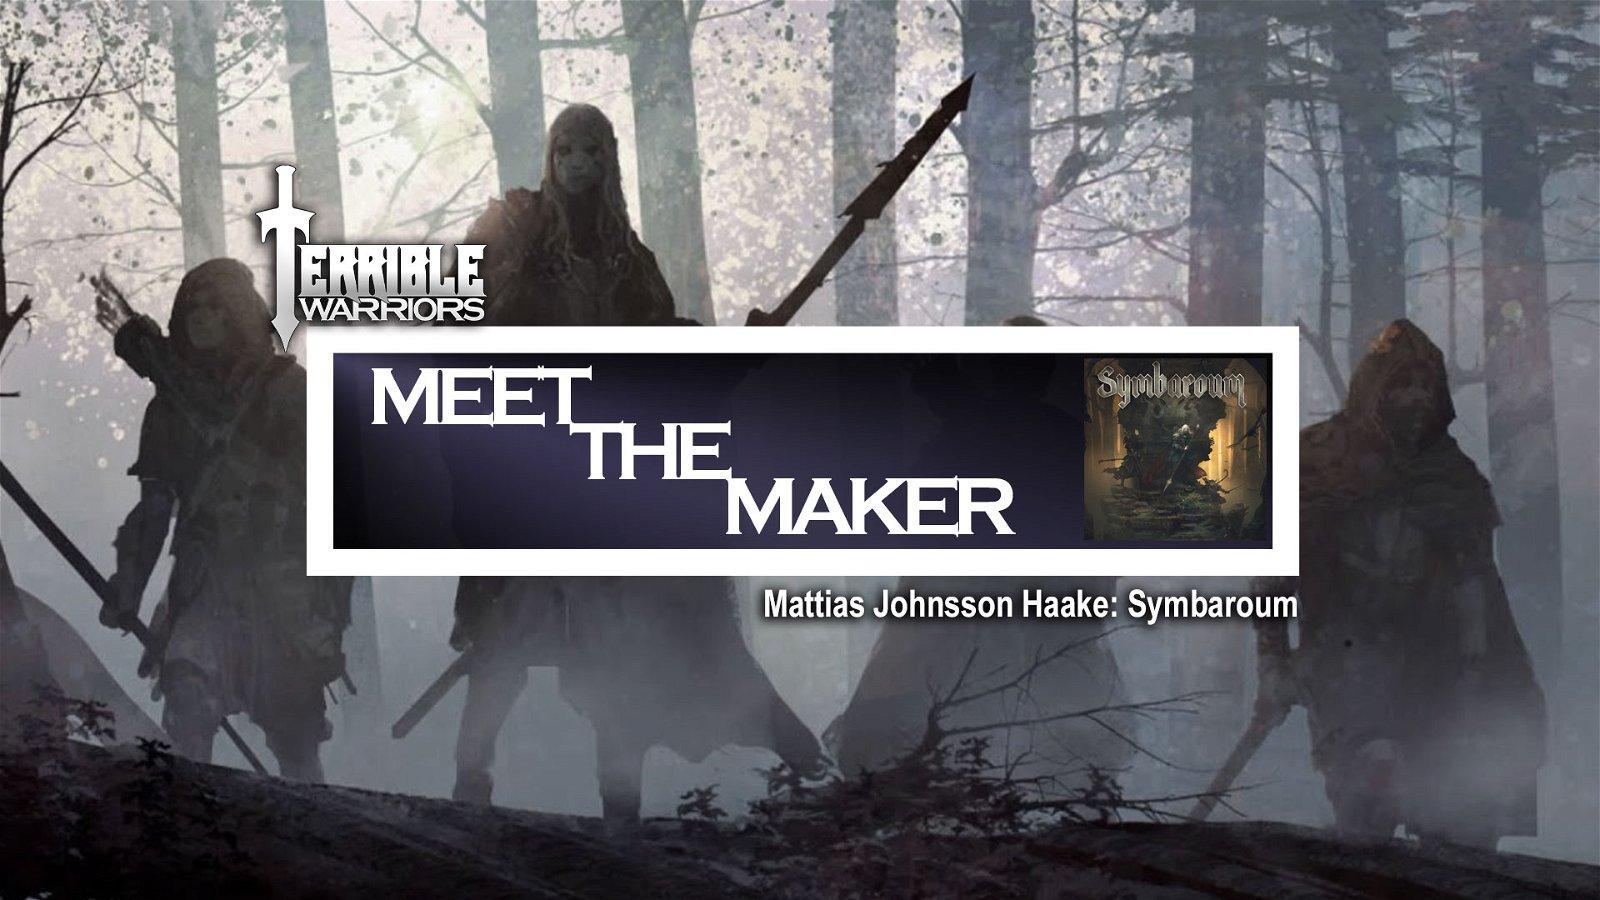 Terrible Warriors - Meet The Makers: Mattias Johnsson Haake (Symbaroum)